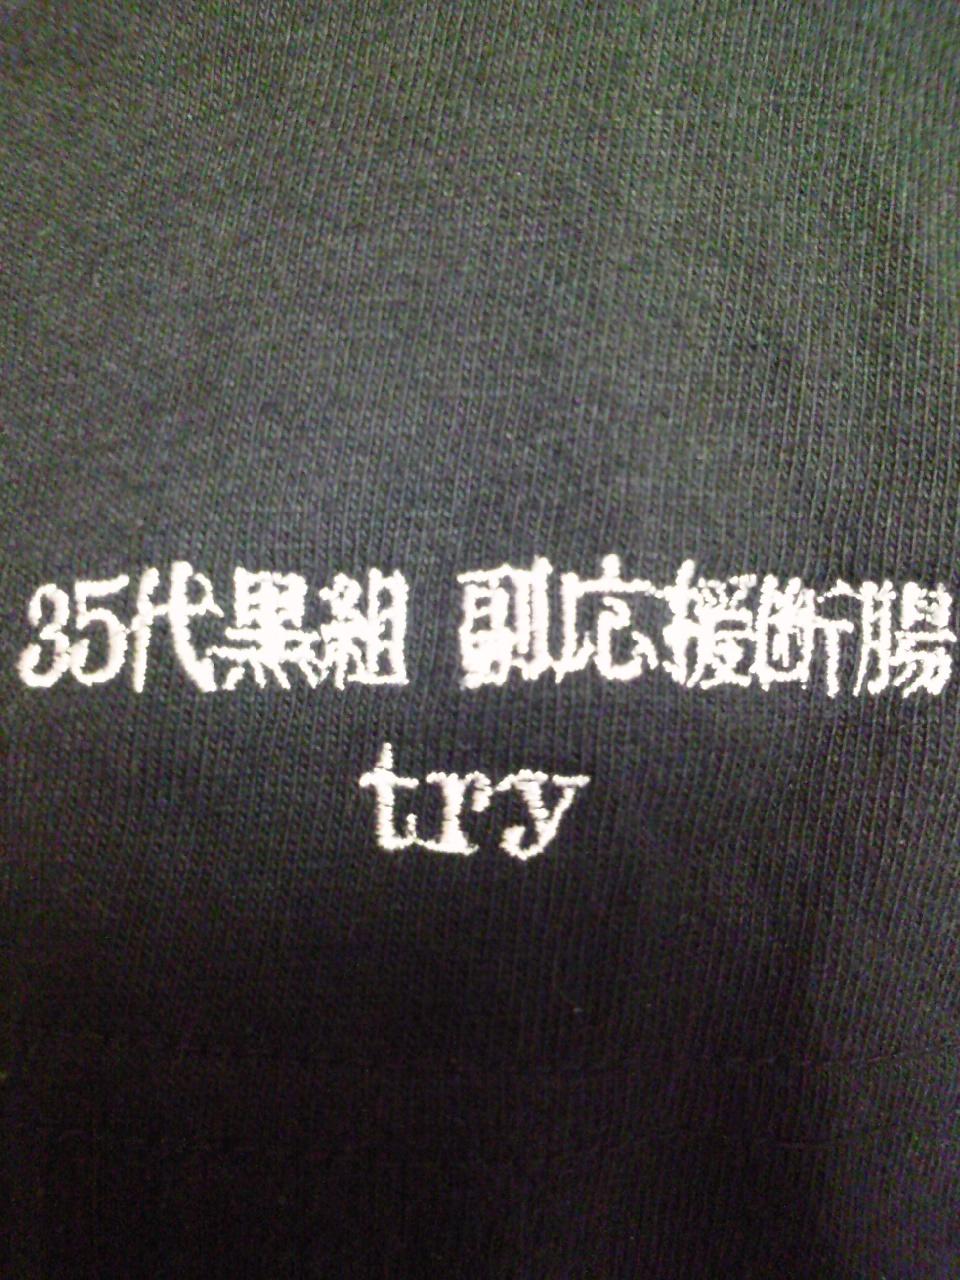 TS3O0129.jpg